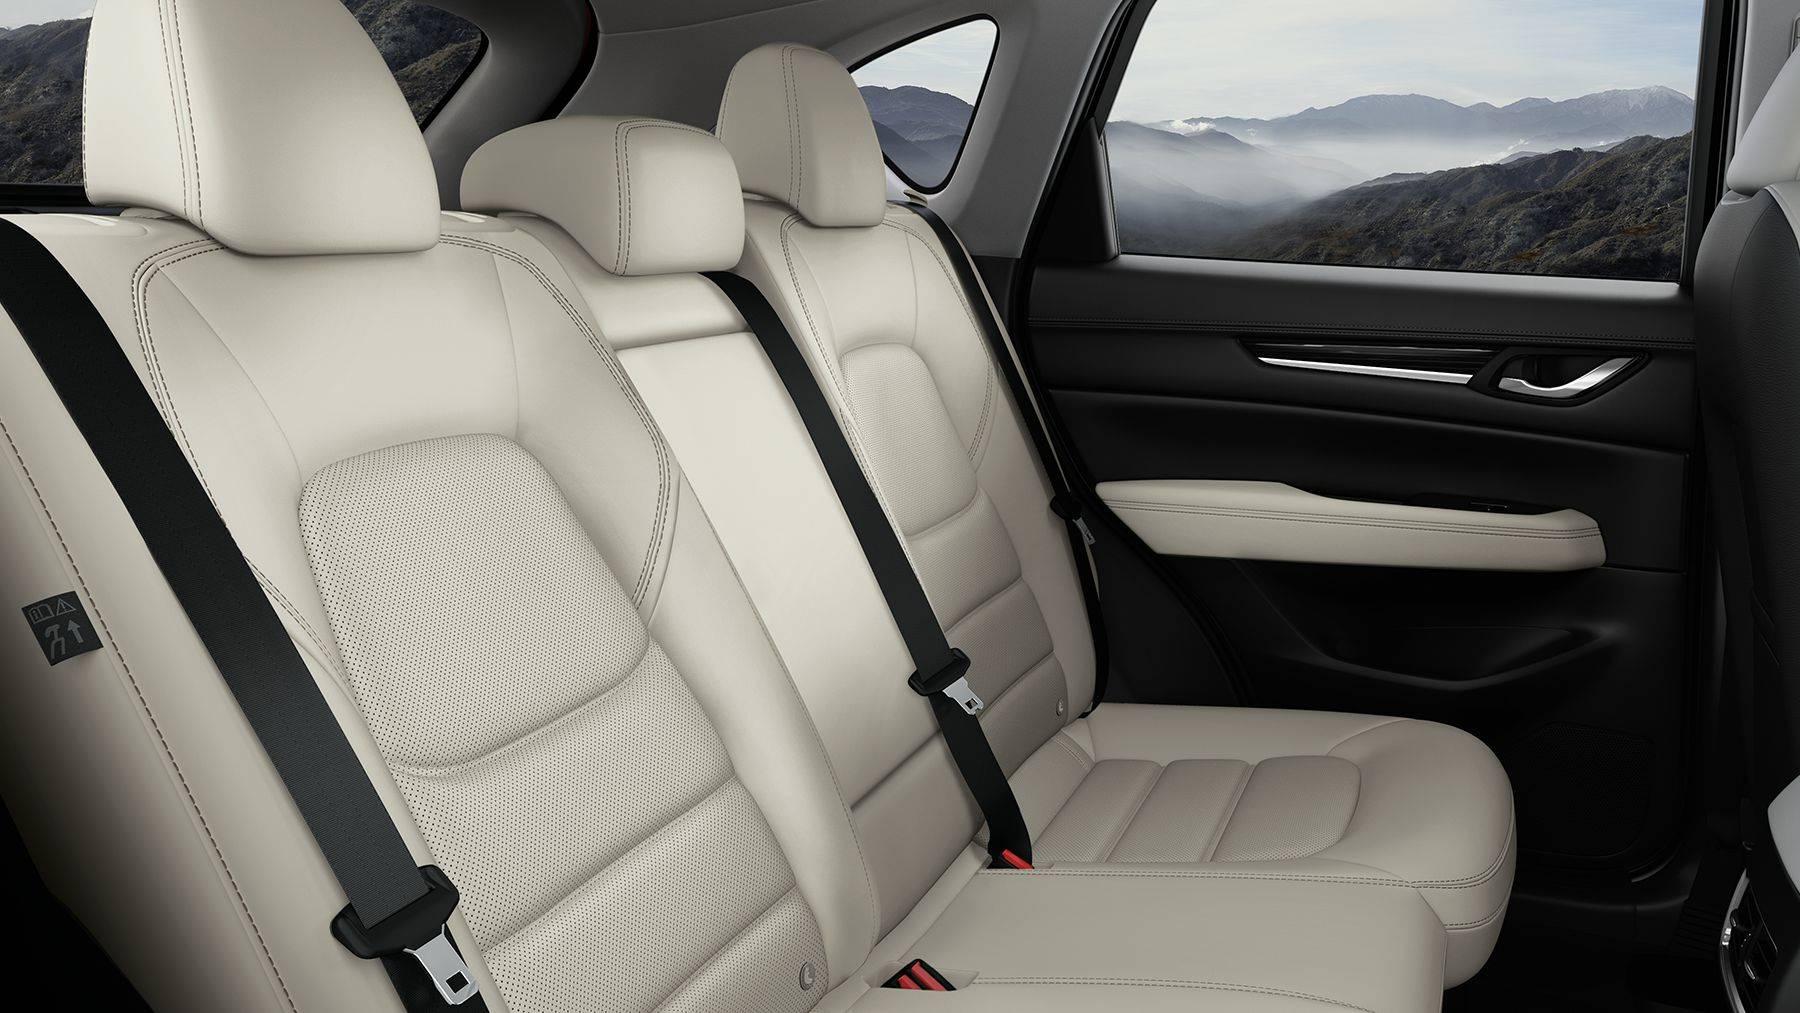 The Mazda CX-5's Spacious Interior